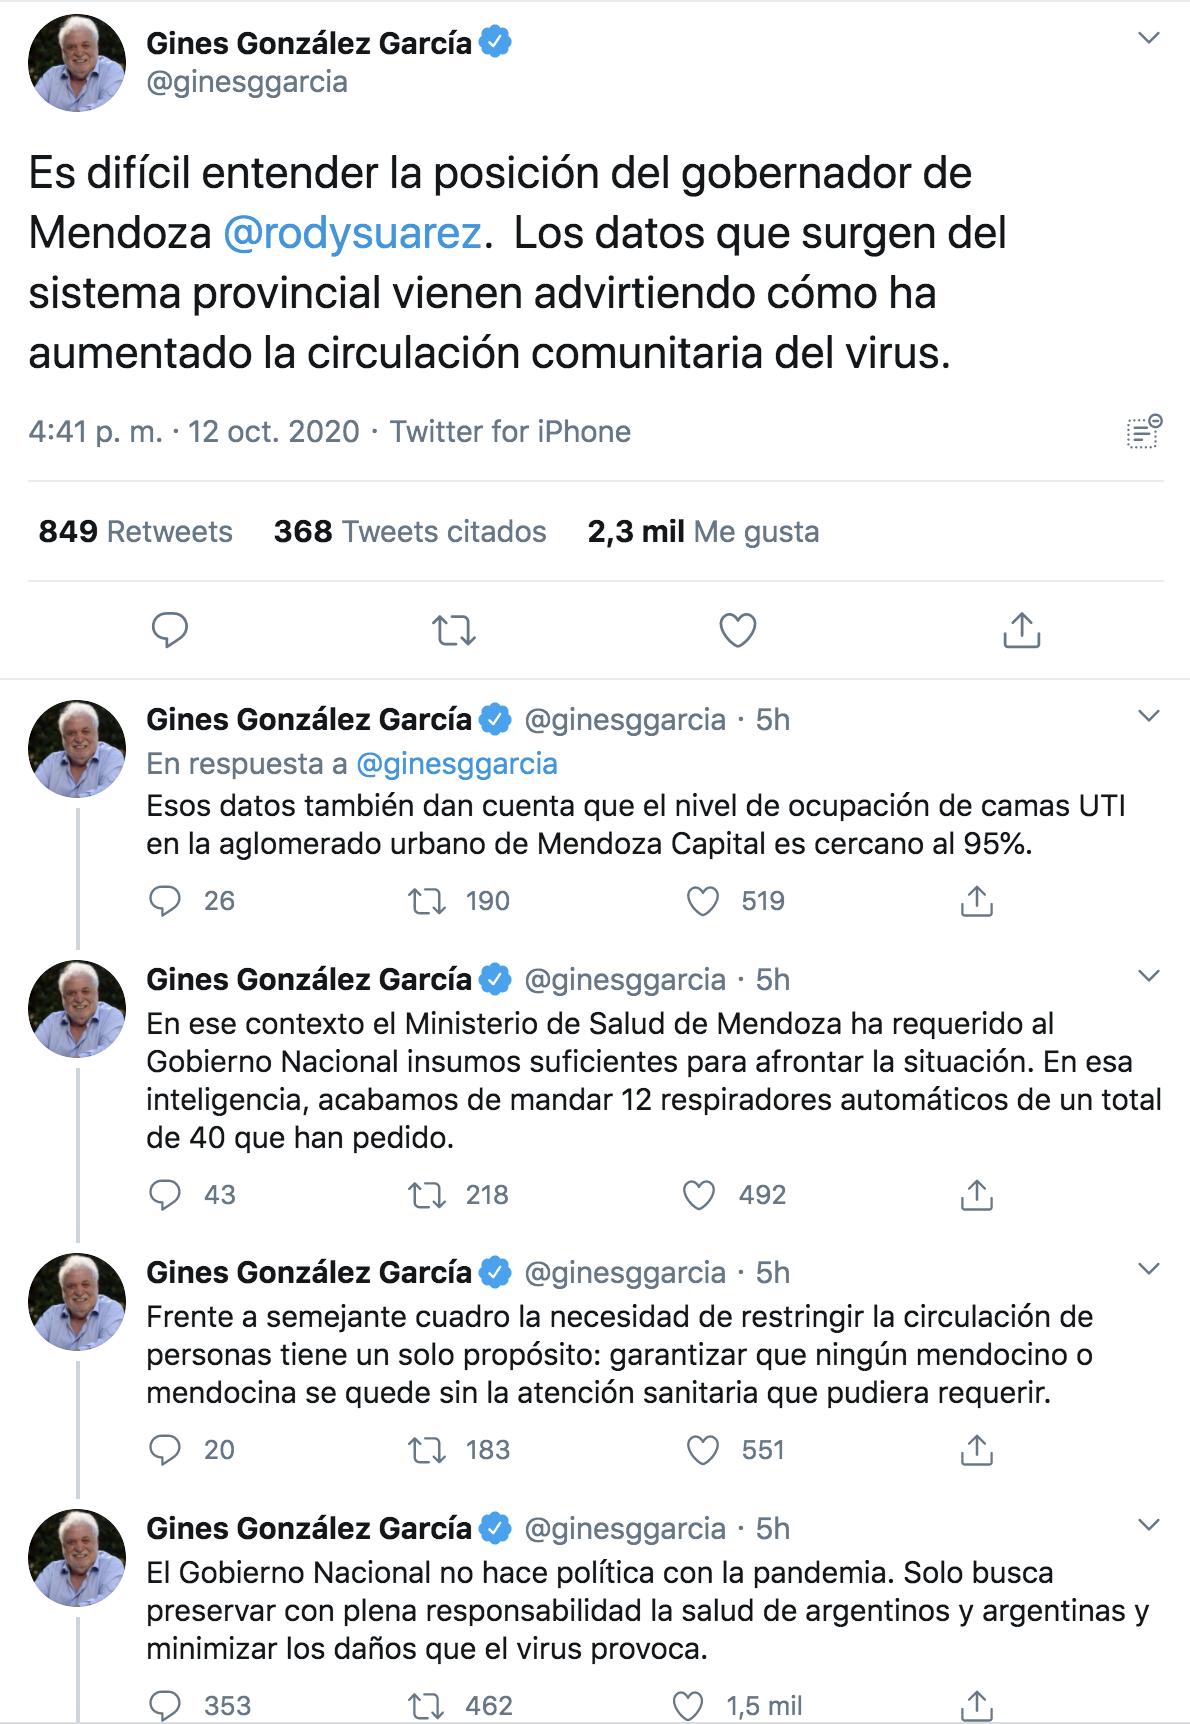 Gines Gonzalez Garcia, sobre la decision de Mendoza: